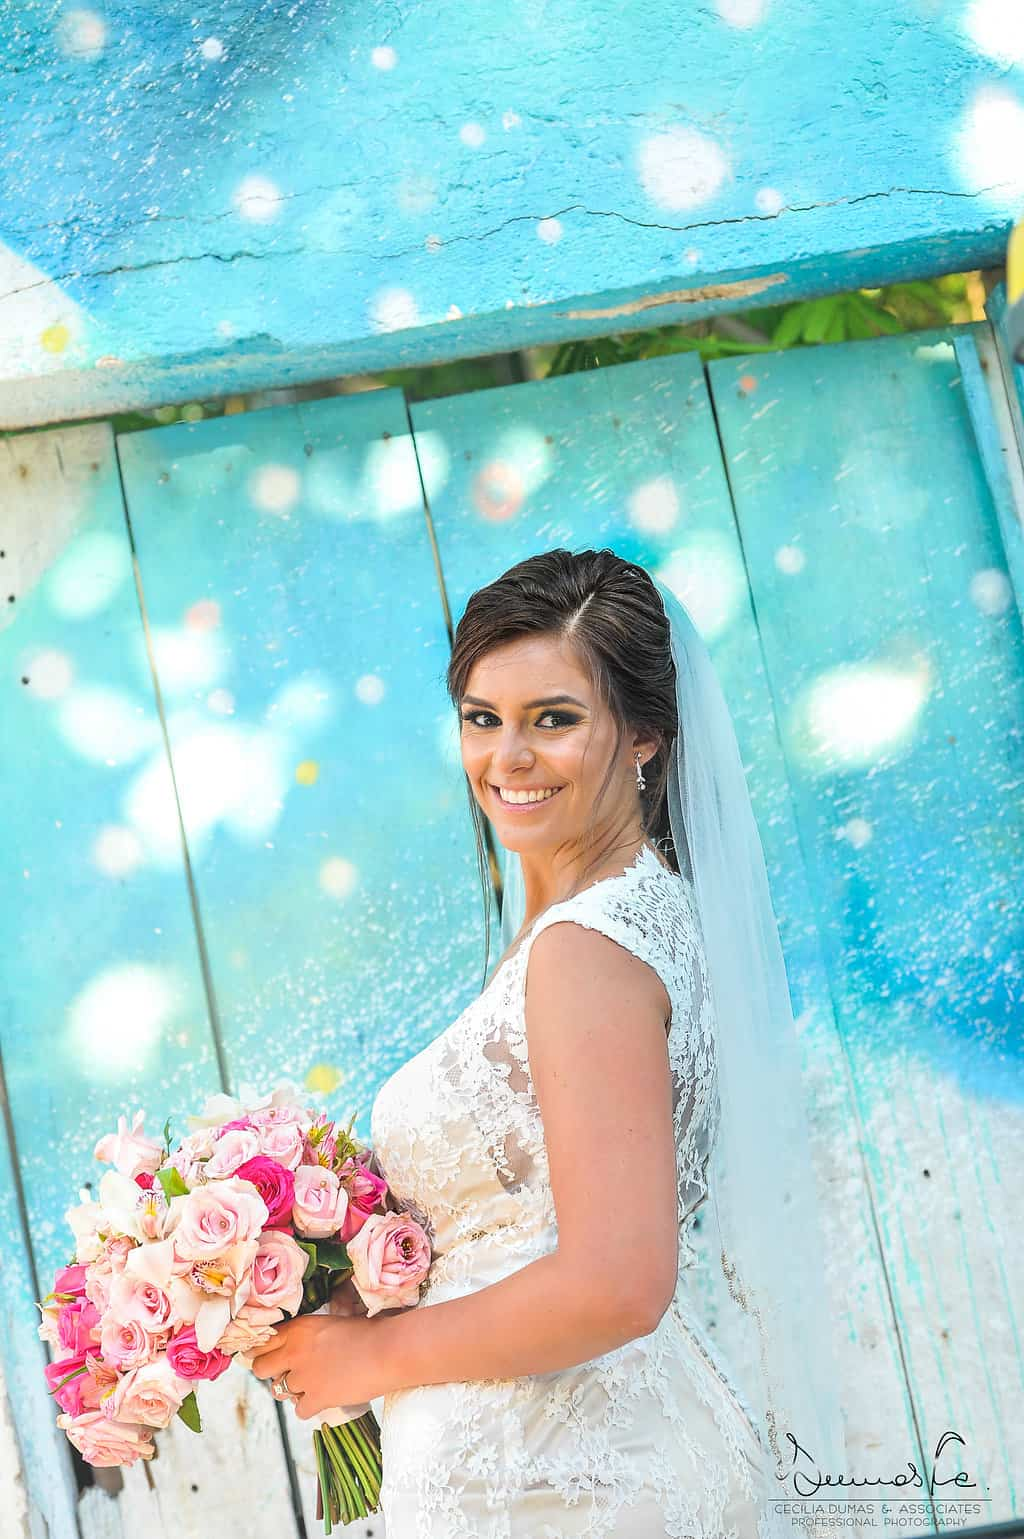 islamujeres-buhos-weddingphotography-giovannarosario35